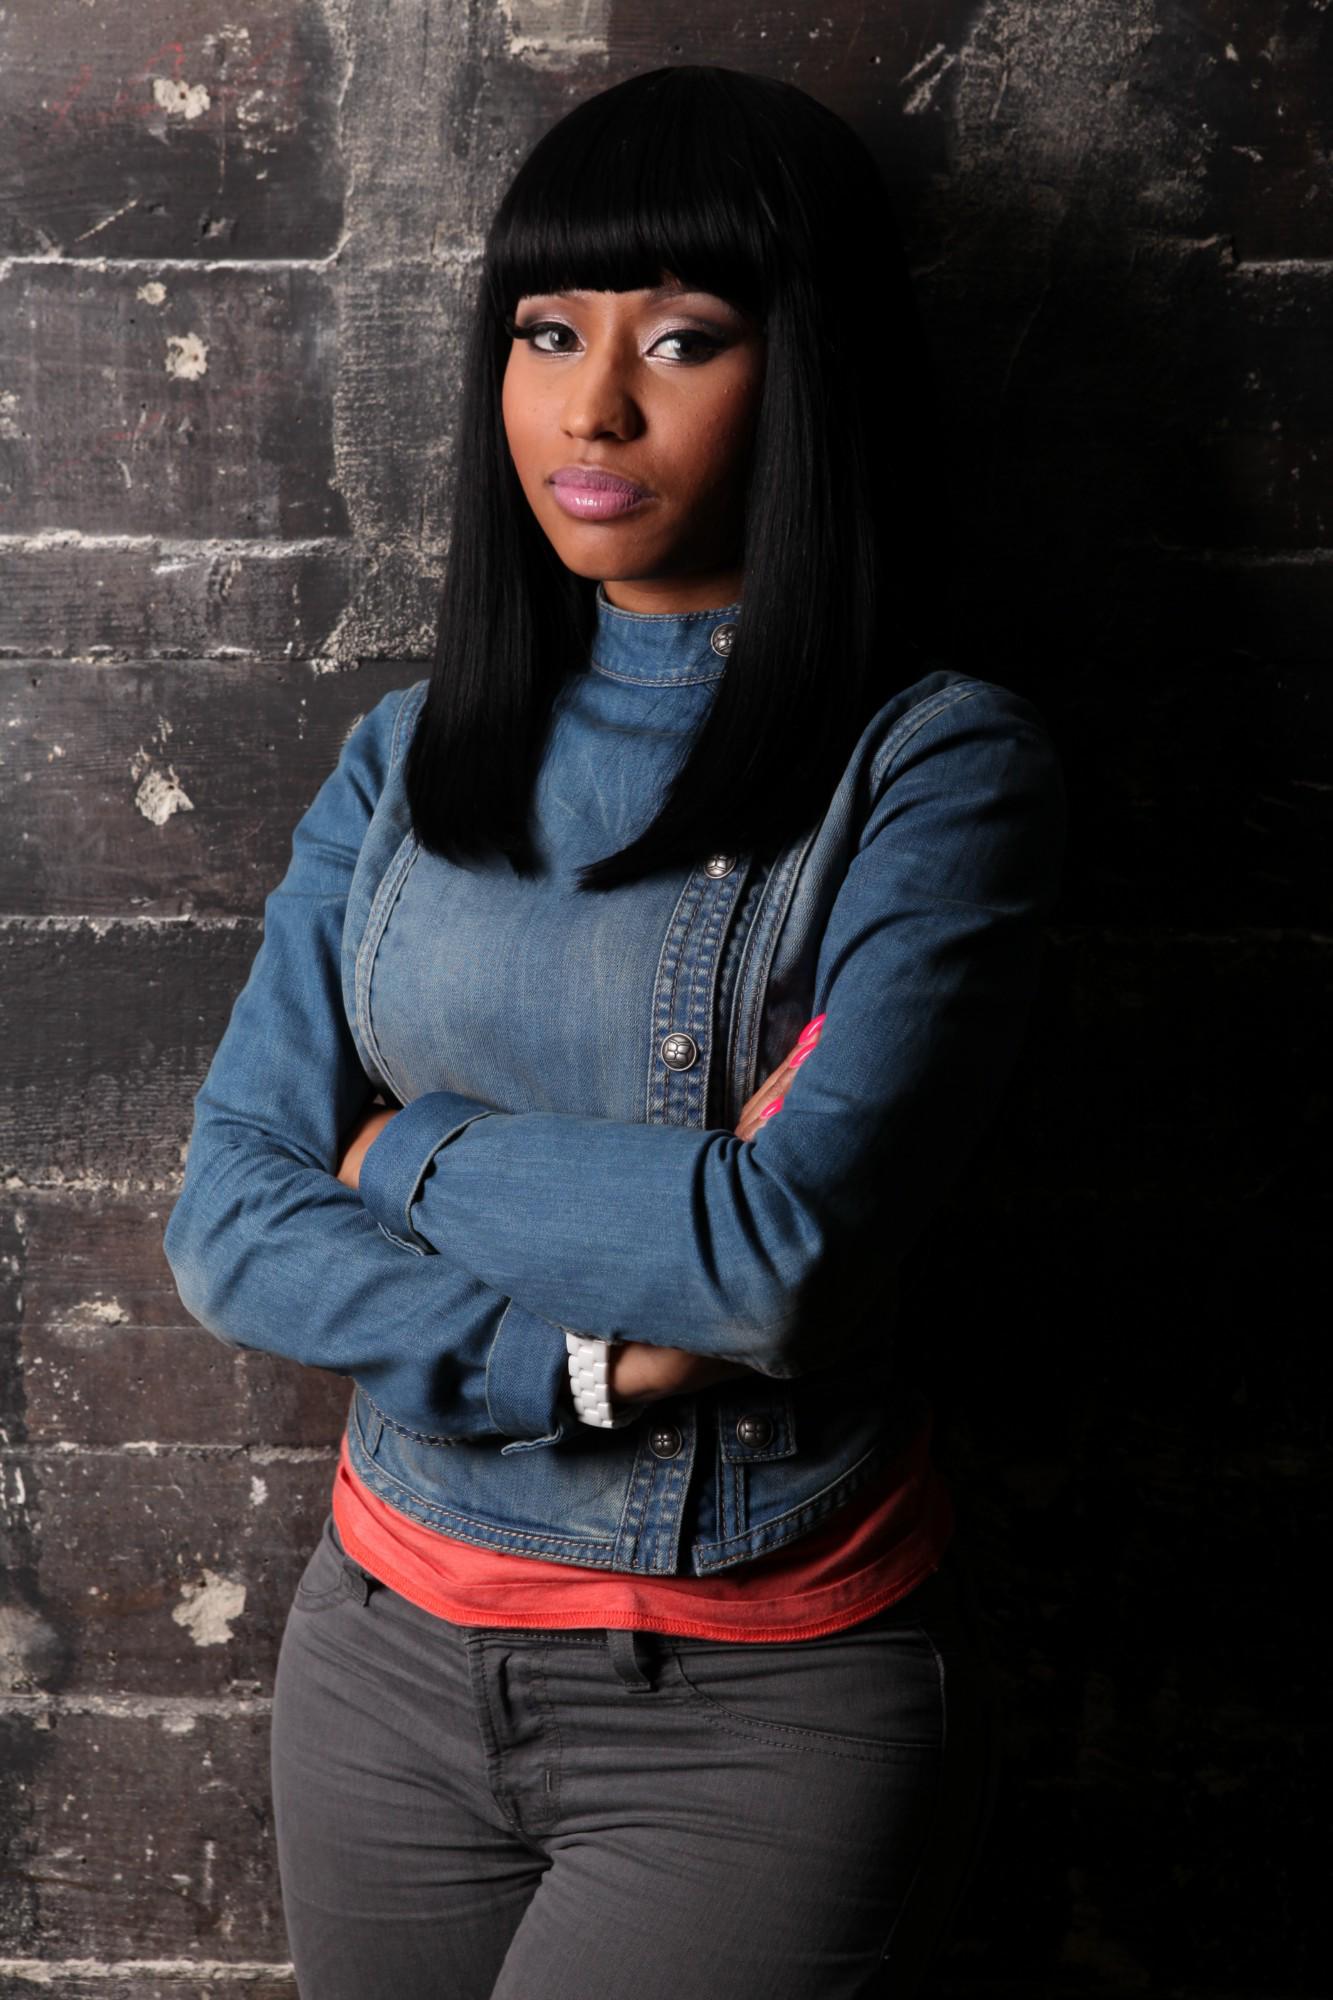 Billboard Photo Shoot Nicki Minaj Wiki Fandom Powered